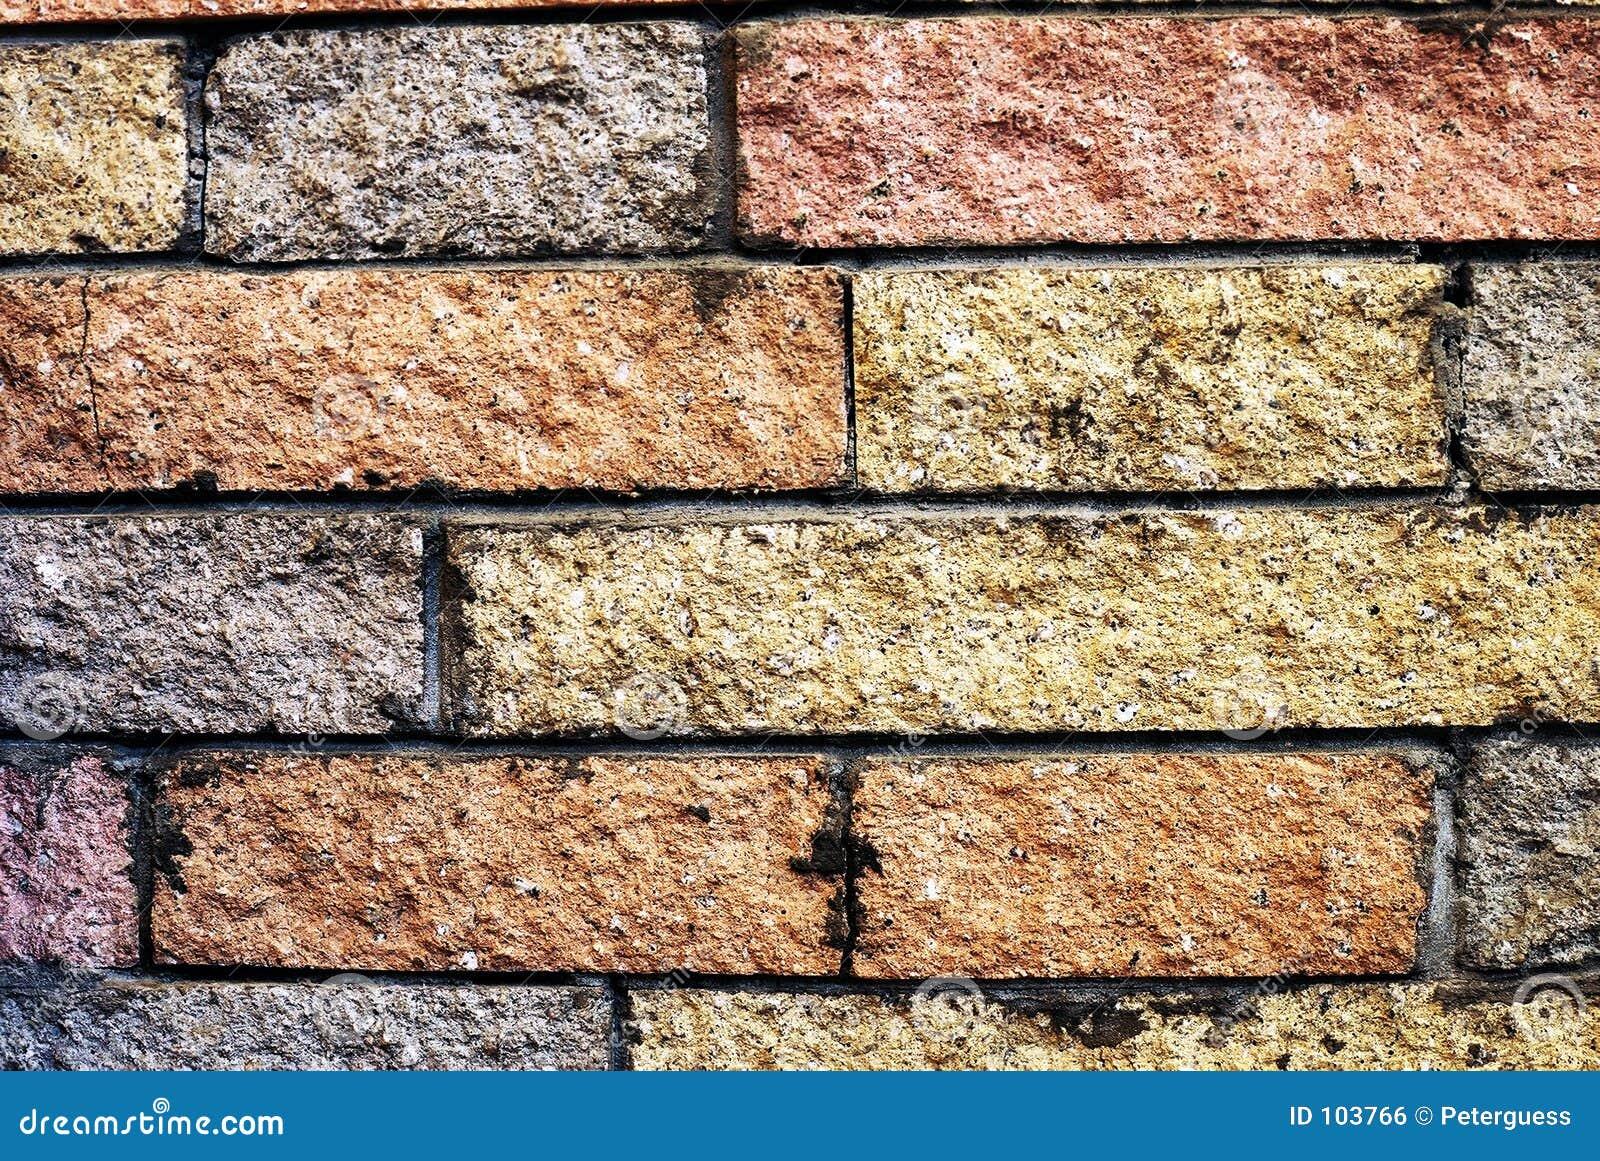 Parede de tijolo decorativa (lareira dos anos 70)